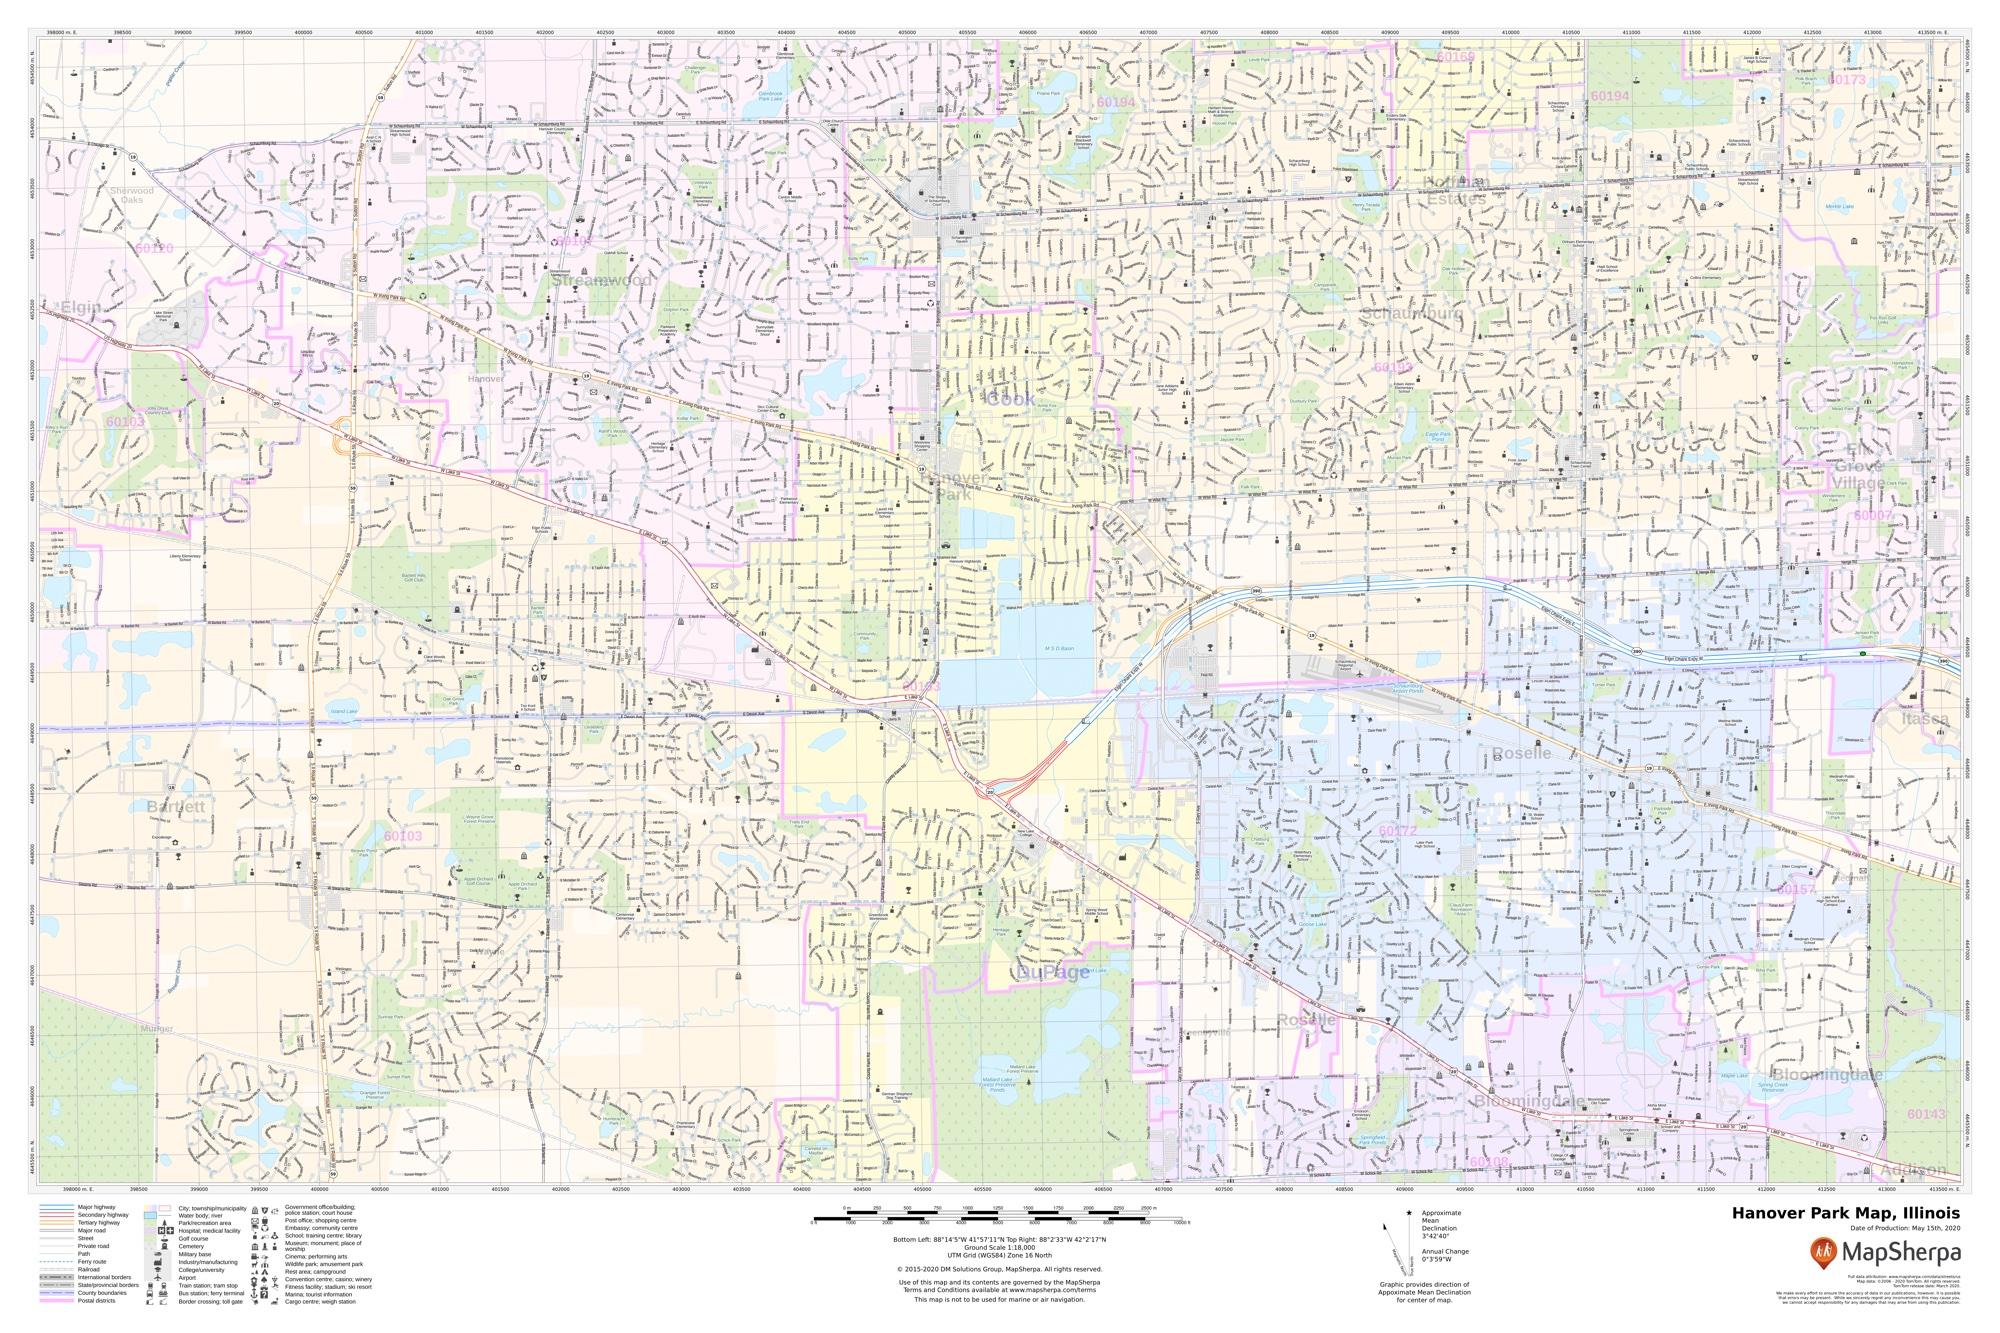 Hanover Park Map, Illinois